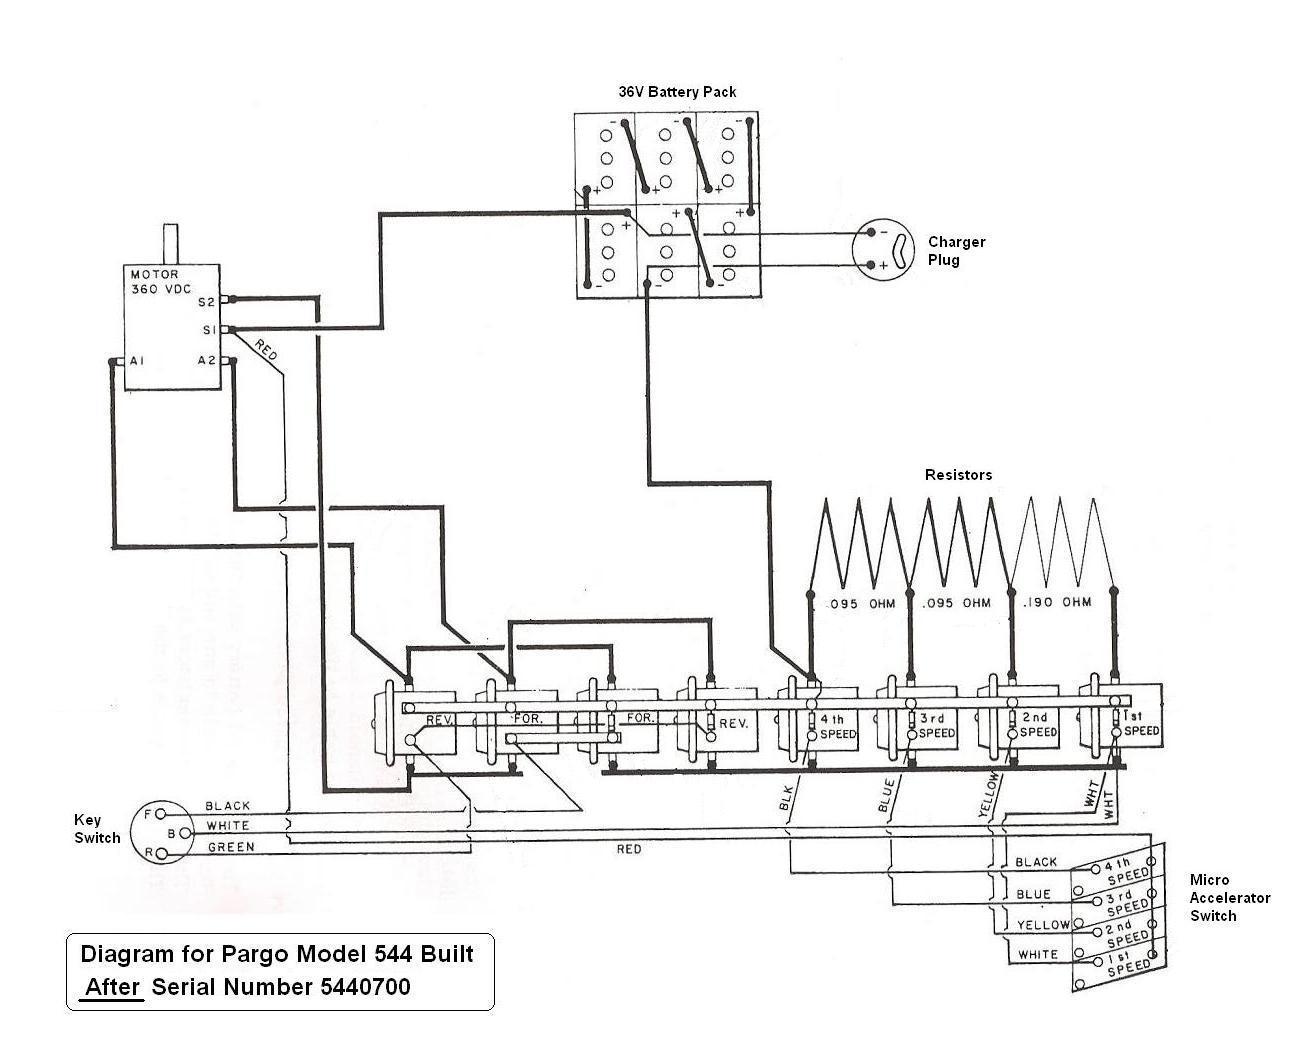 EB_9206] Melex Golf Cart Wiring Diagram Also Ez Go Golf Cart Wiring Diagram  Download DiagramSalv Nful Rect Mohammedshrine Librar Wiring 101